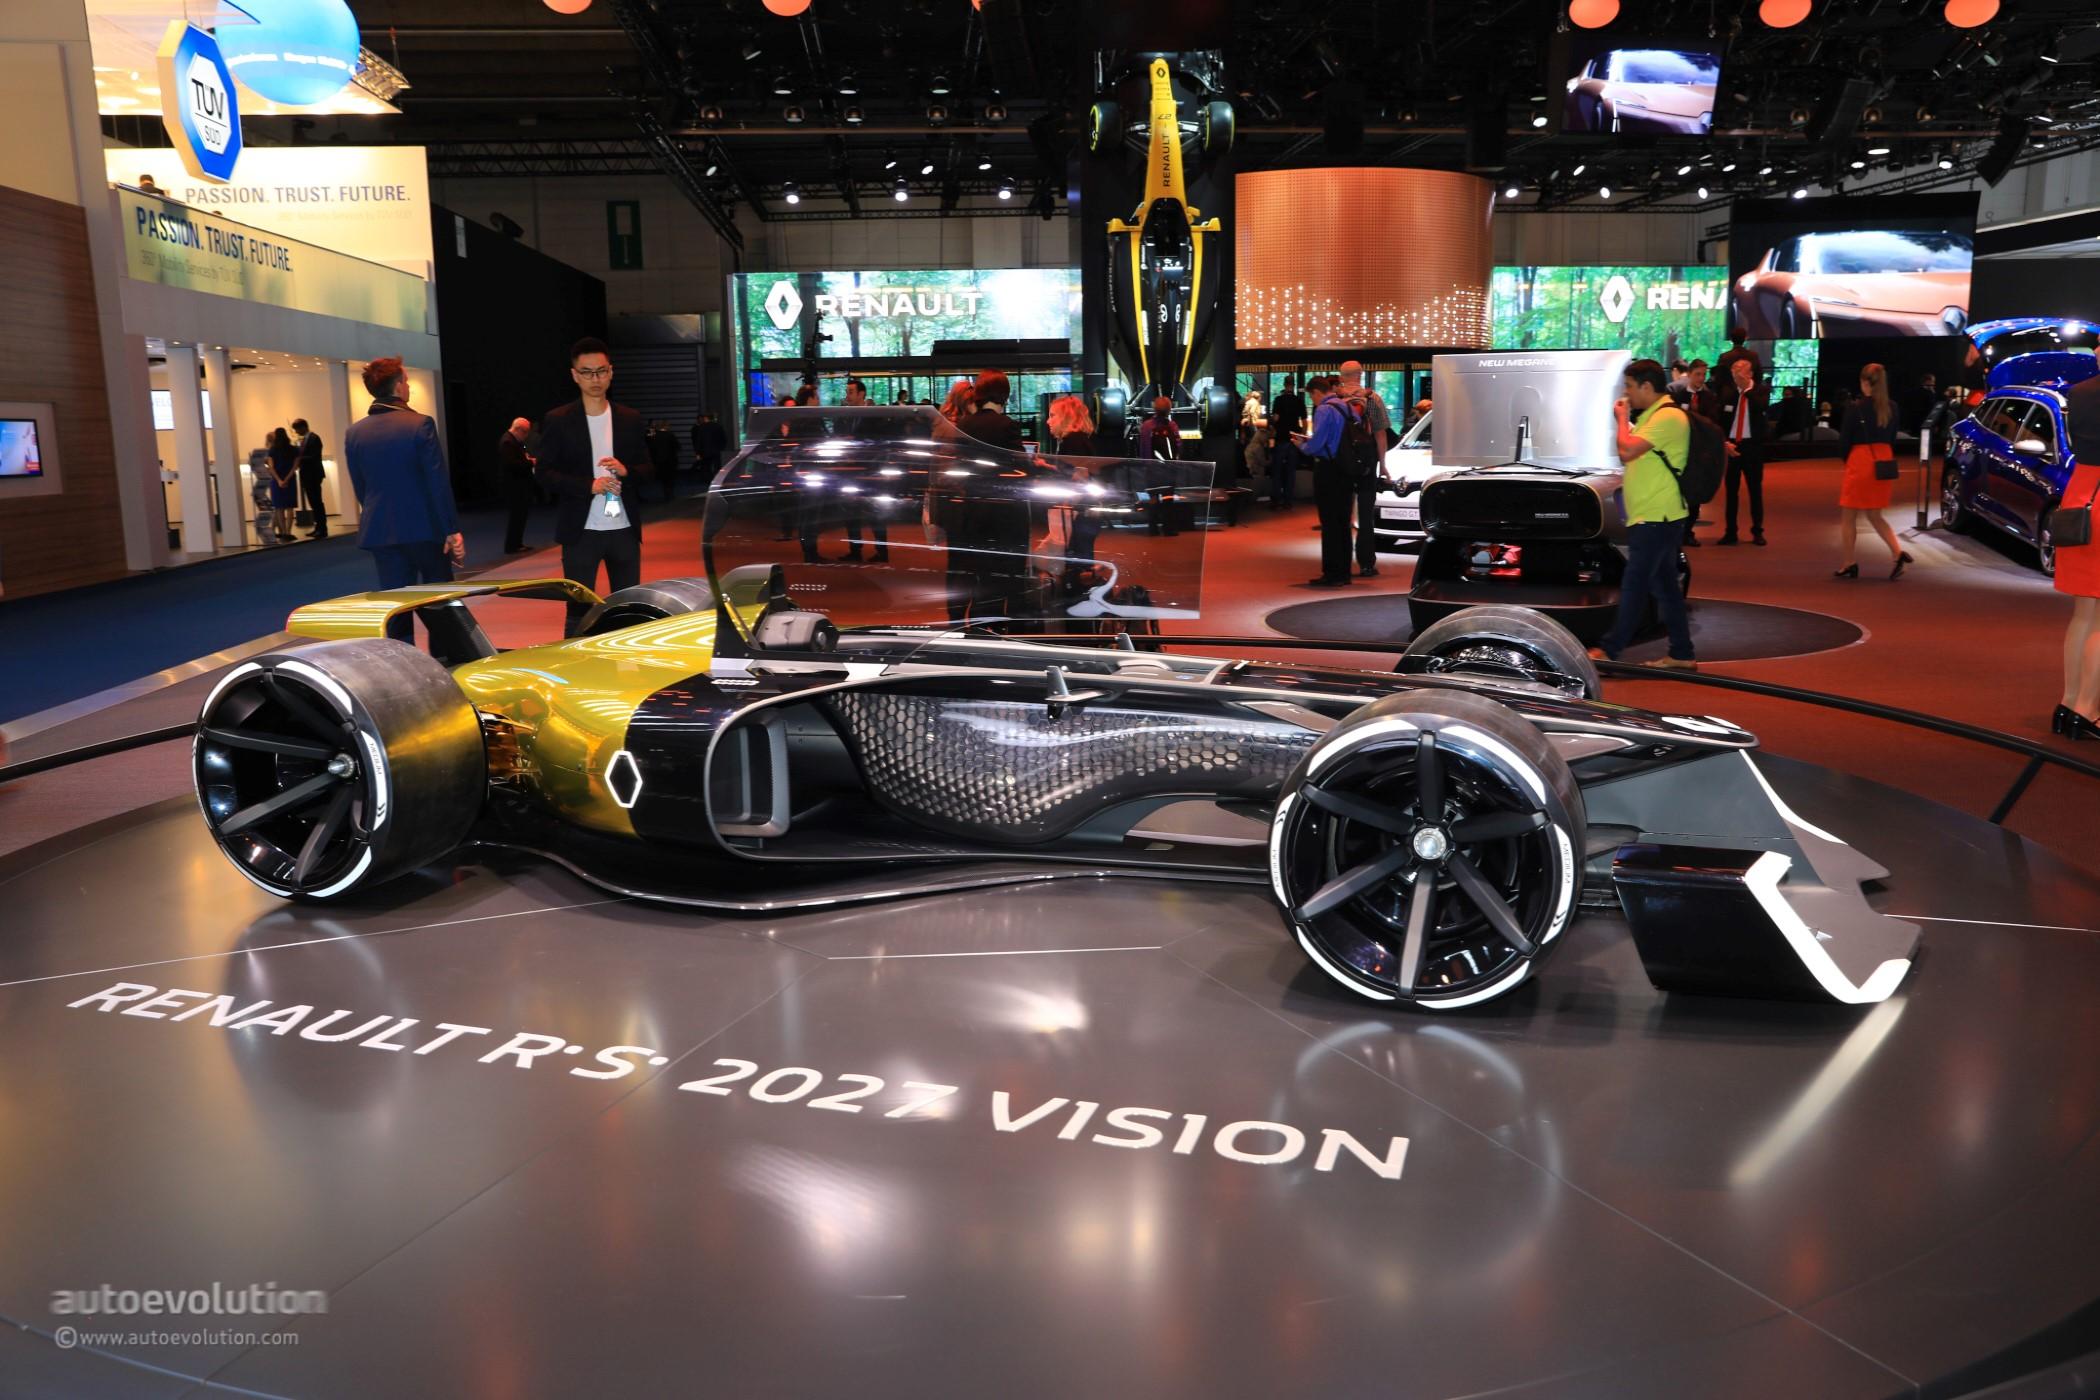 Futuristic Formula 1 Concept Poses Next To 2018 Renault